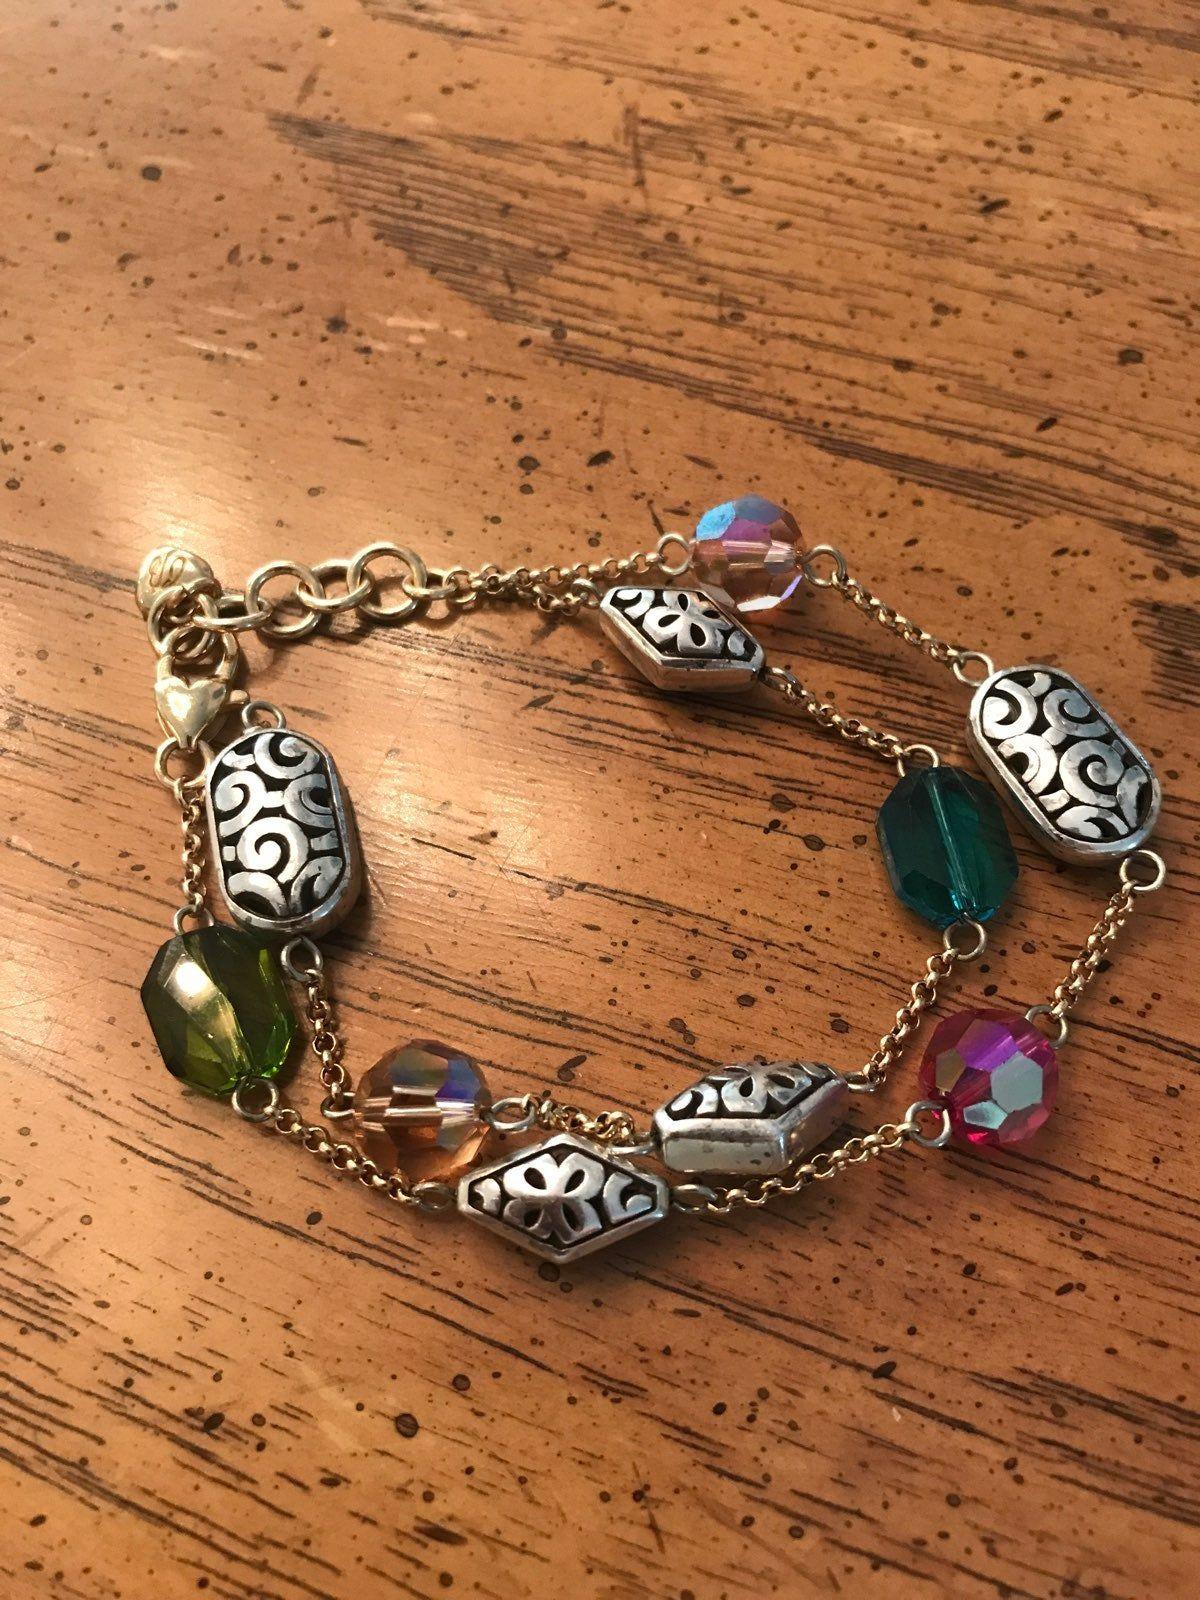 33++ Where can i find brighton jewelry ideas